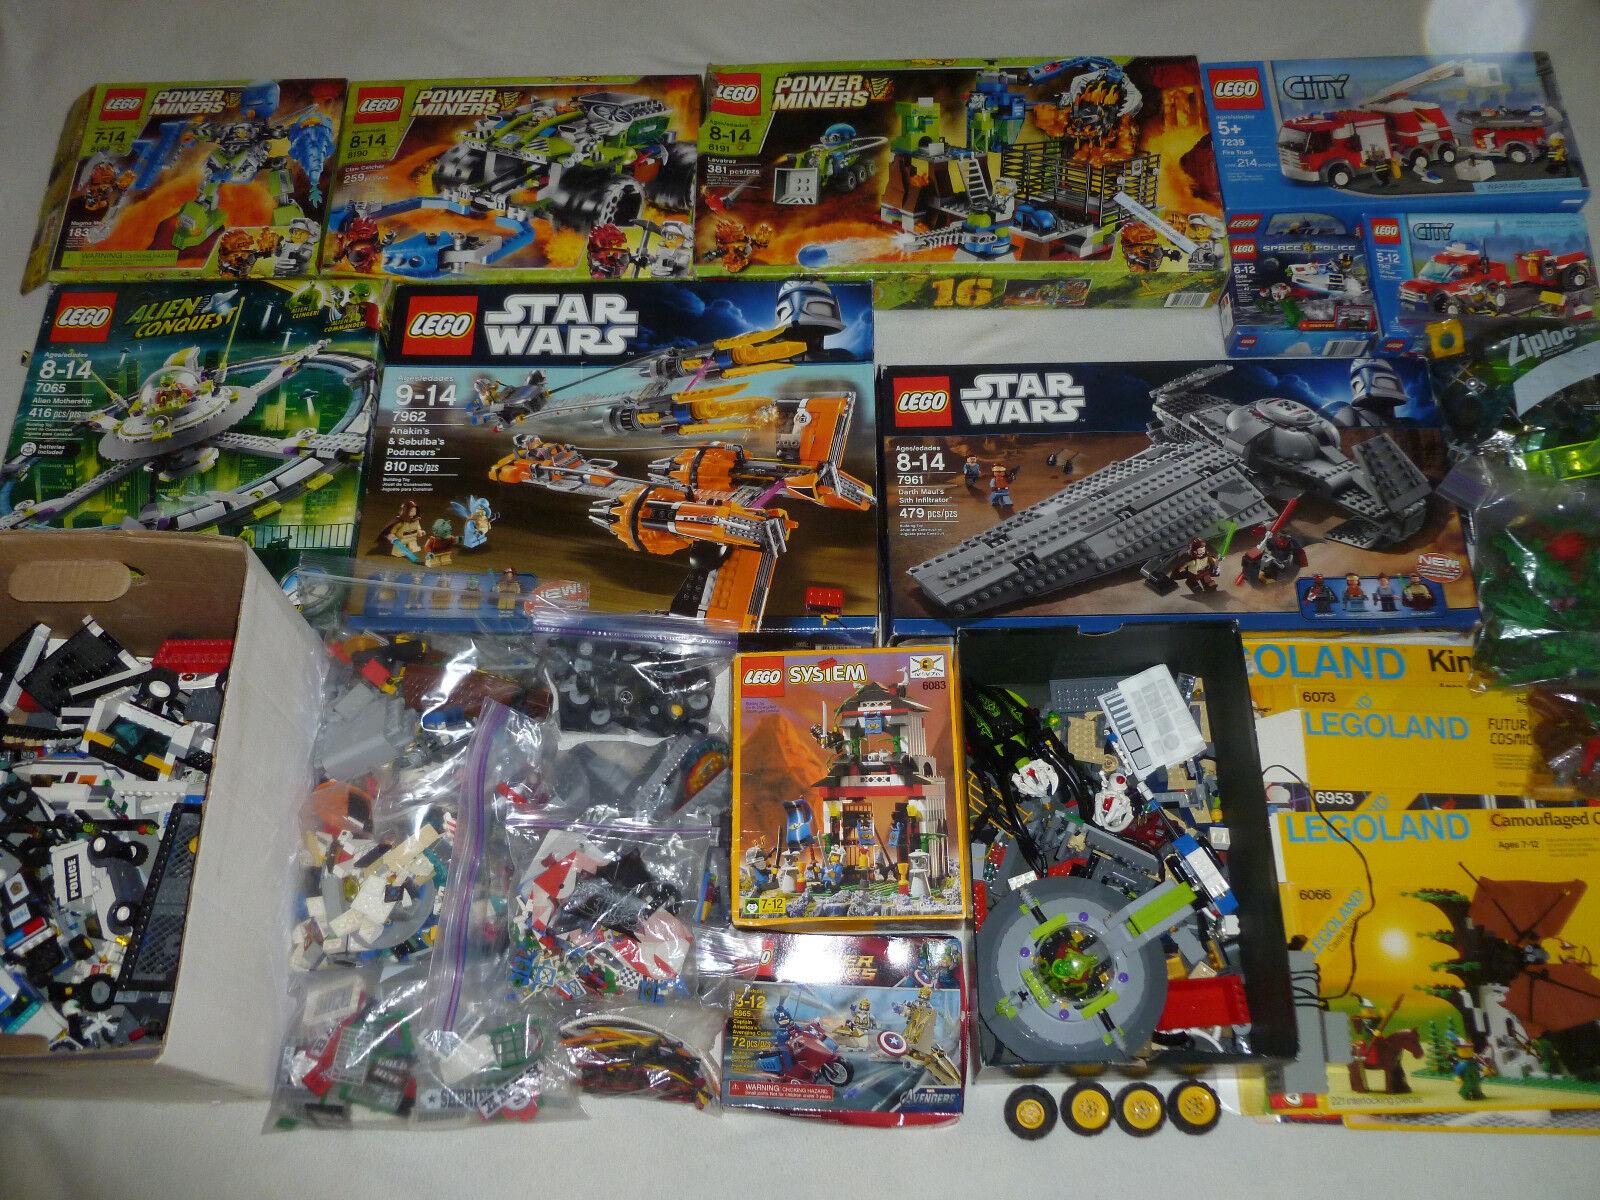 HUGE LEGO LOT 7239 8190 8189 8189 8189 81917961 6083 7962 6080 STAR WARS MINIFIG 6953 6073 1ed35c